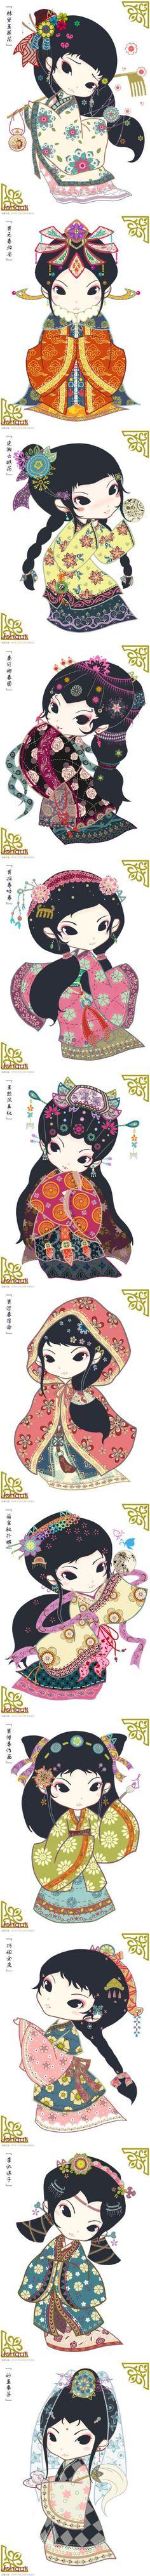 Pin de Iris Seijo:dolls